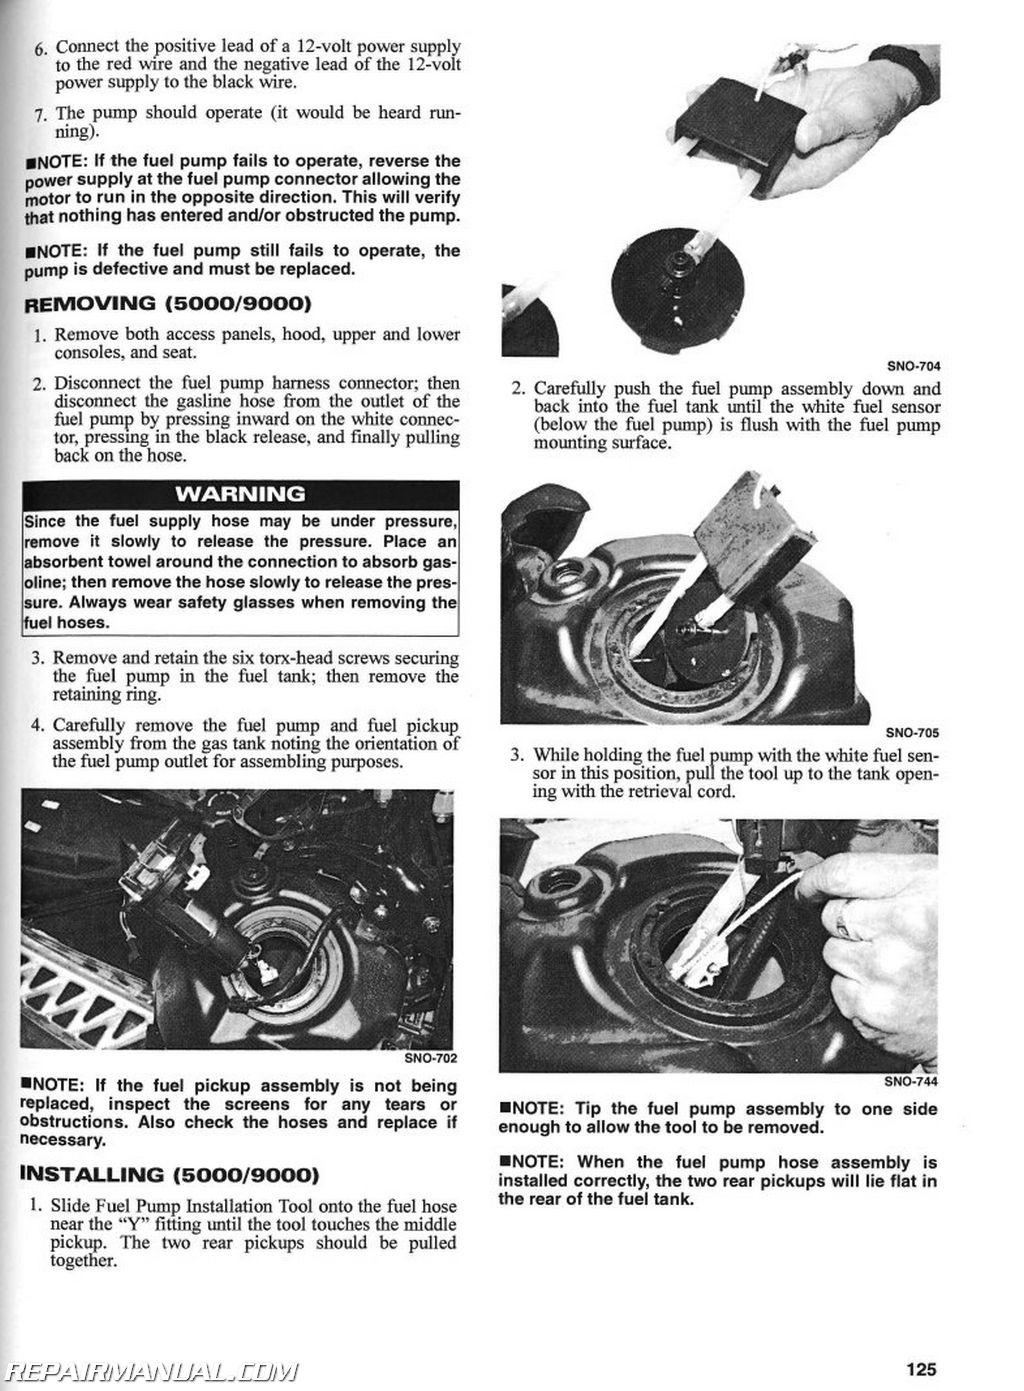 2004 arctic cat snowmobile service manual